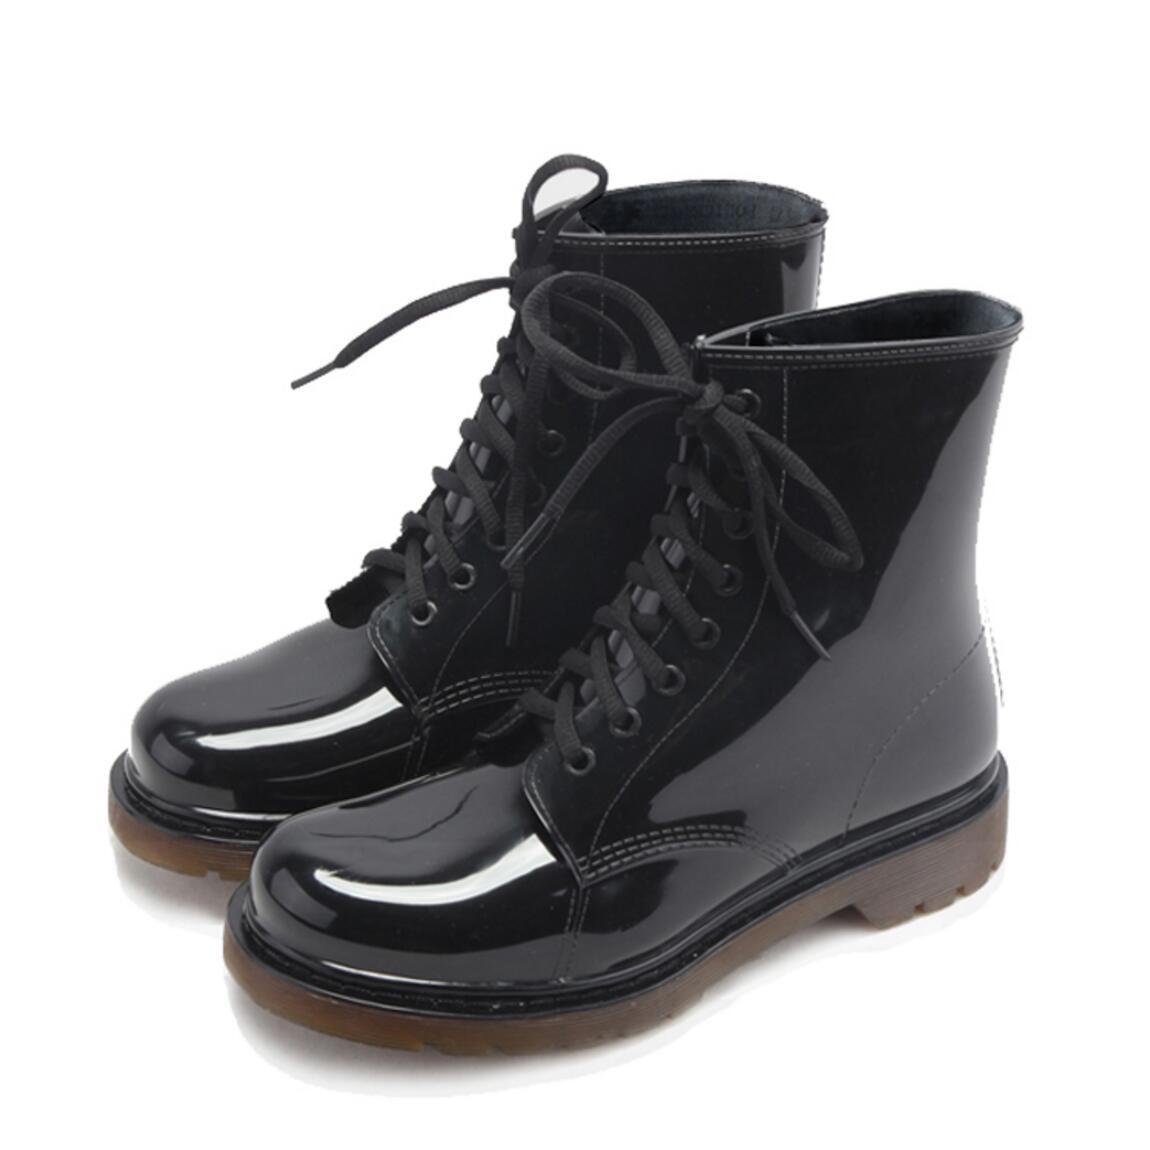 Koovan Μπότες Boots Man 2018 Νέα μόδα Ανδρικά - Ανδρικά υποδήματα - Φωτογραφία 3